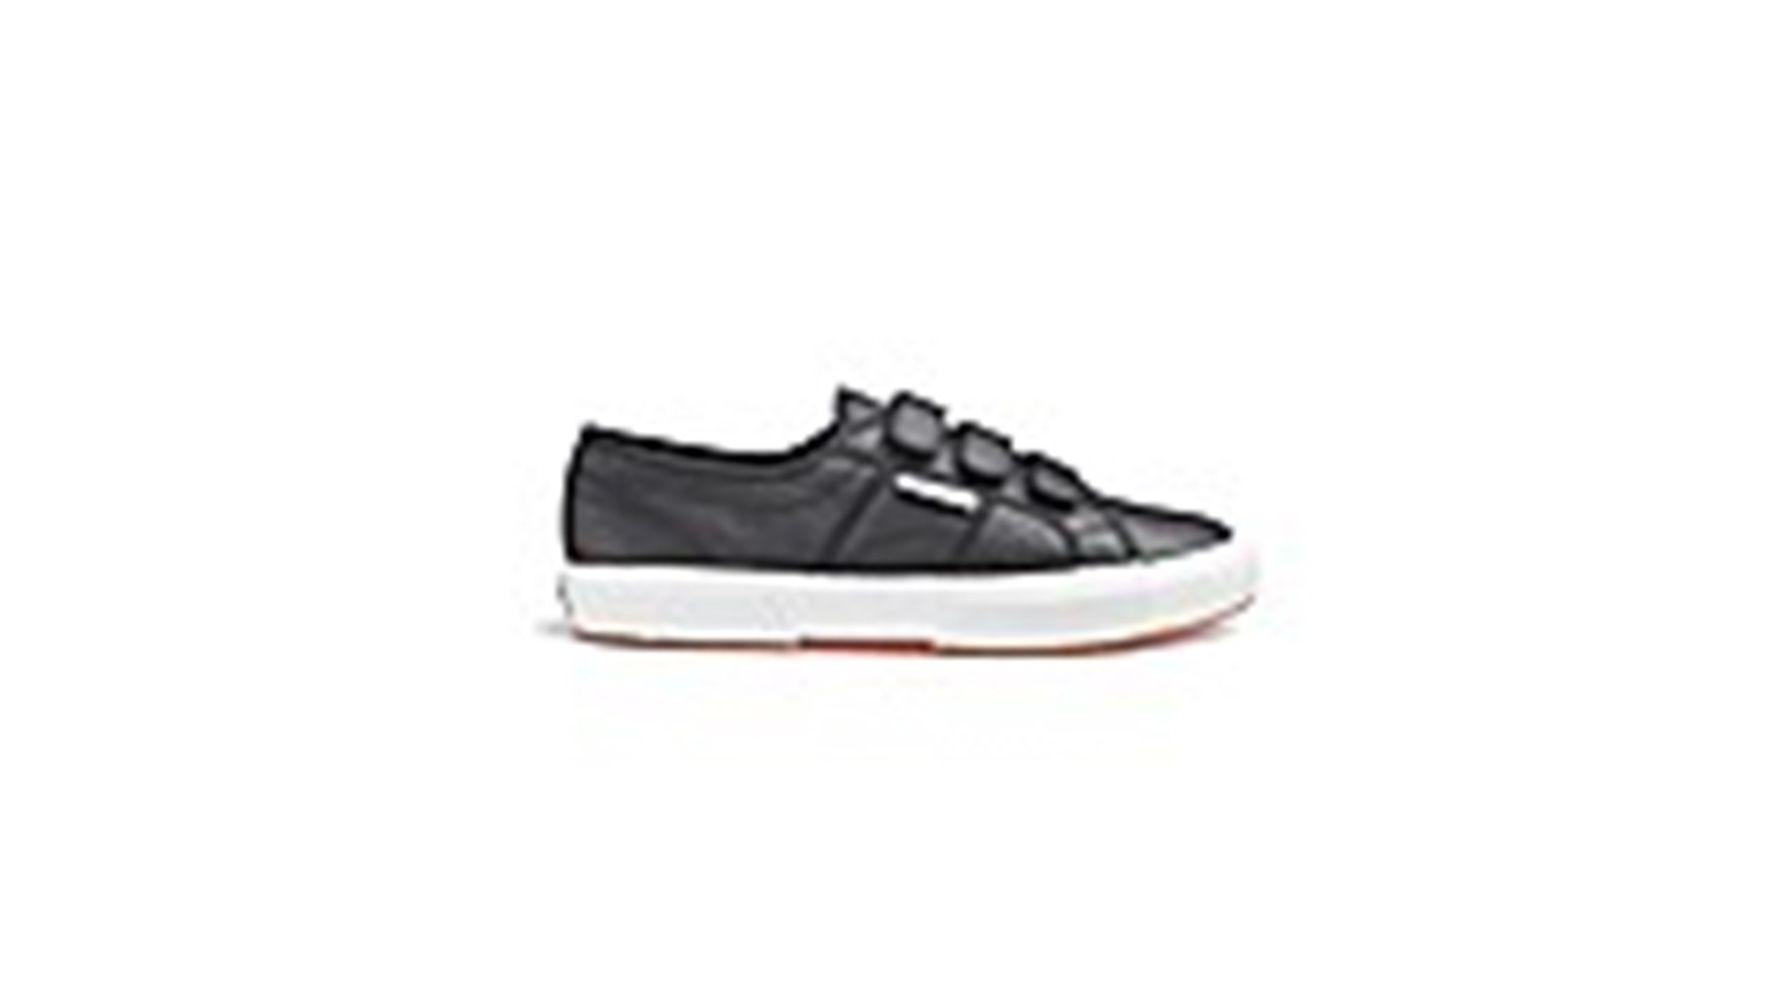 Huge Branded Shoe Sale Bonanza Inc Ugg, Nike, Dune, Timberland, Adidas, KSwiss, Doc Martins And Lots More